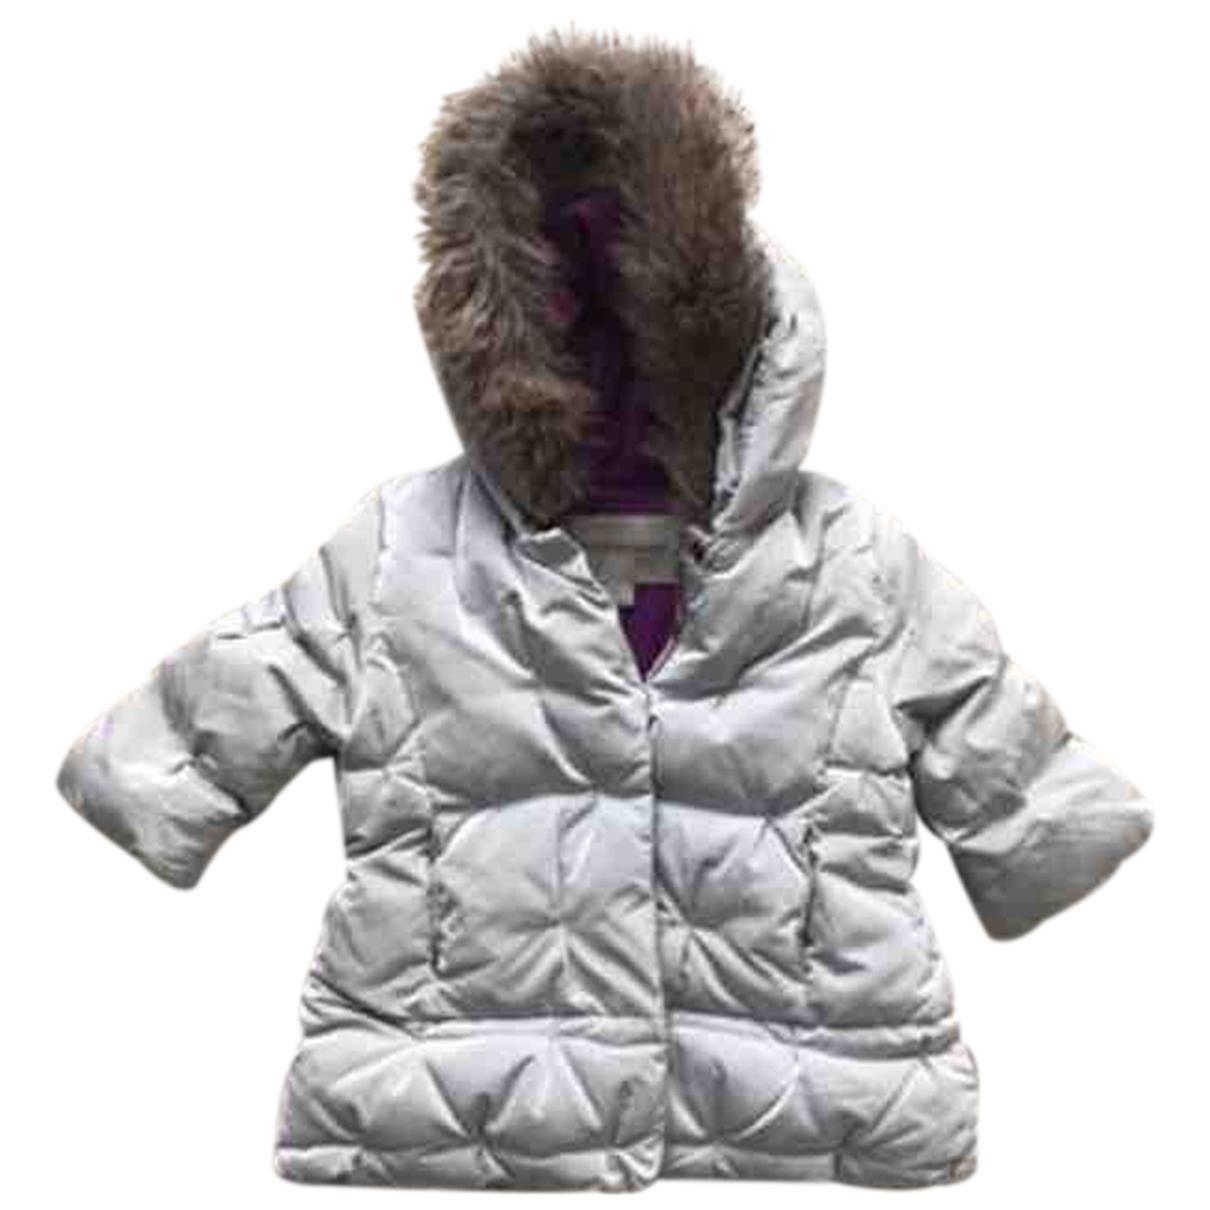 Burberry \N Grey jacket & coat for Kids 6 months - up to 67cm FR